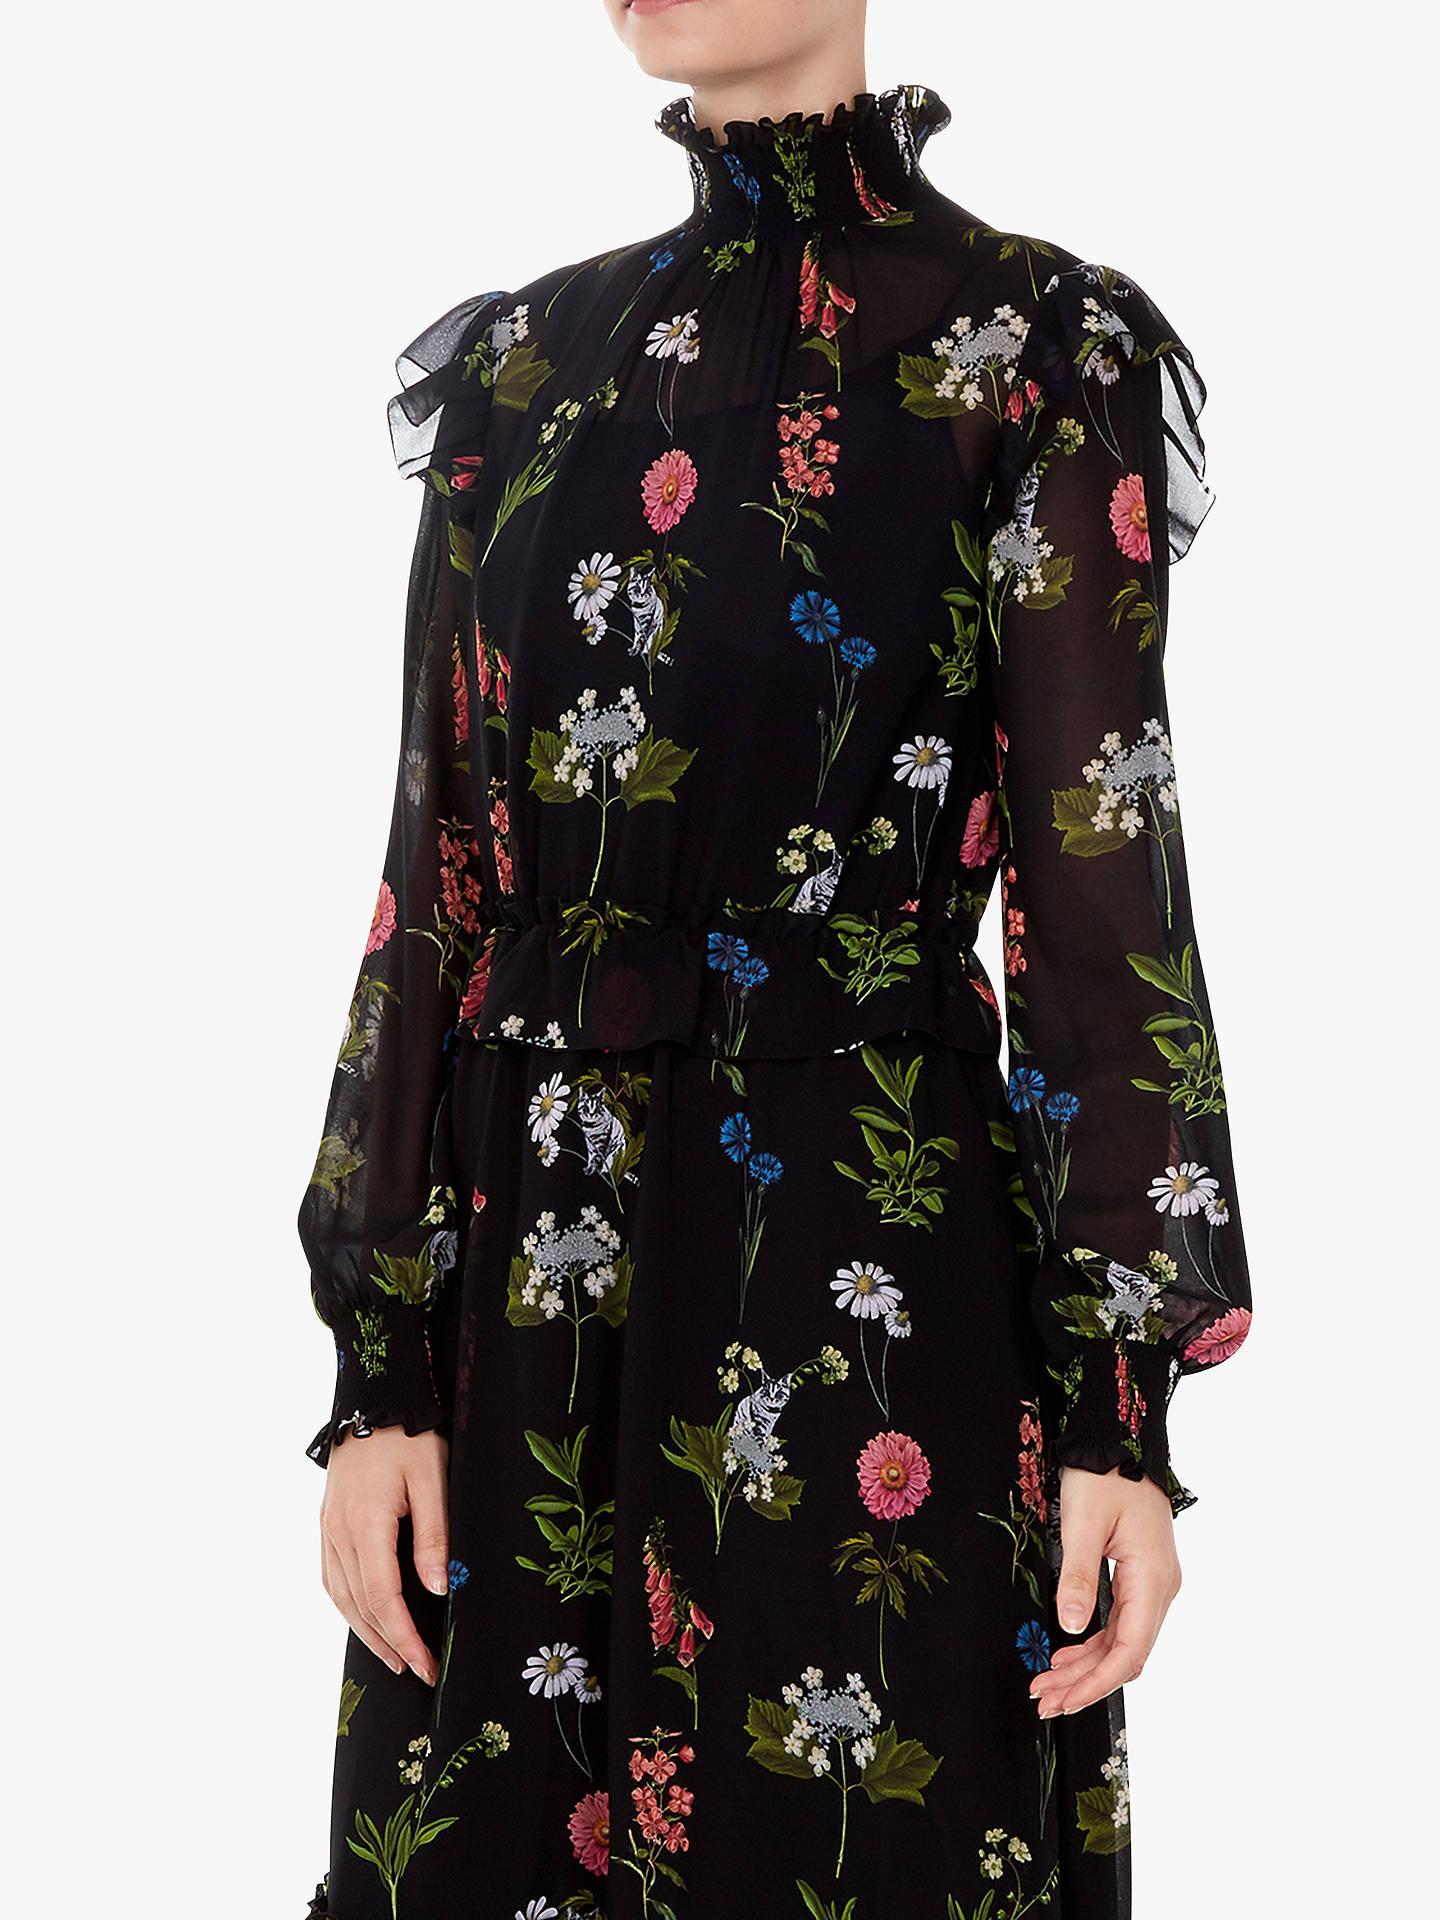 d52a784ec20b ... Buy Ted Baker Siliia Kirtstenbosch Embroidered Wrap Dress